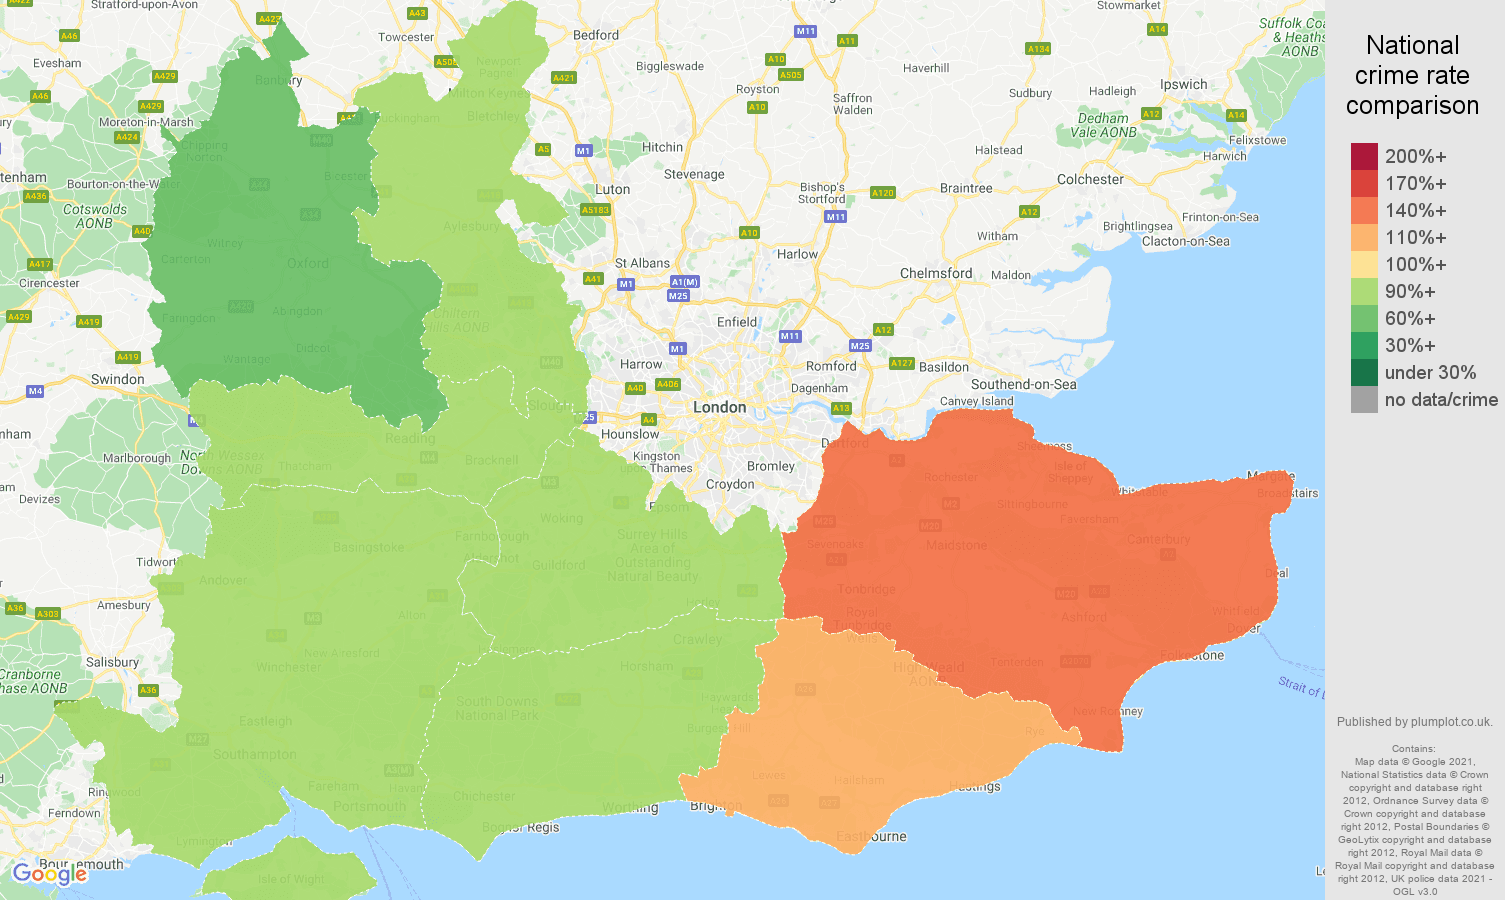 South East criminal damage and arson crime rate comparison map